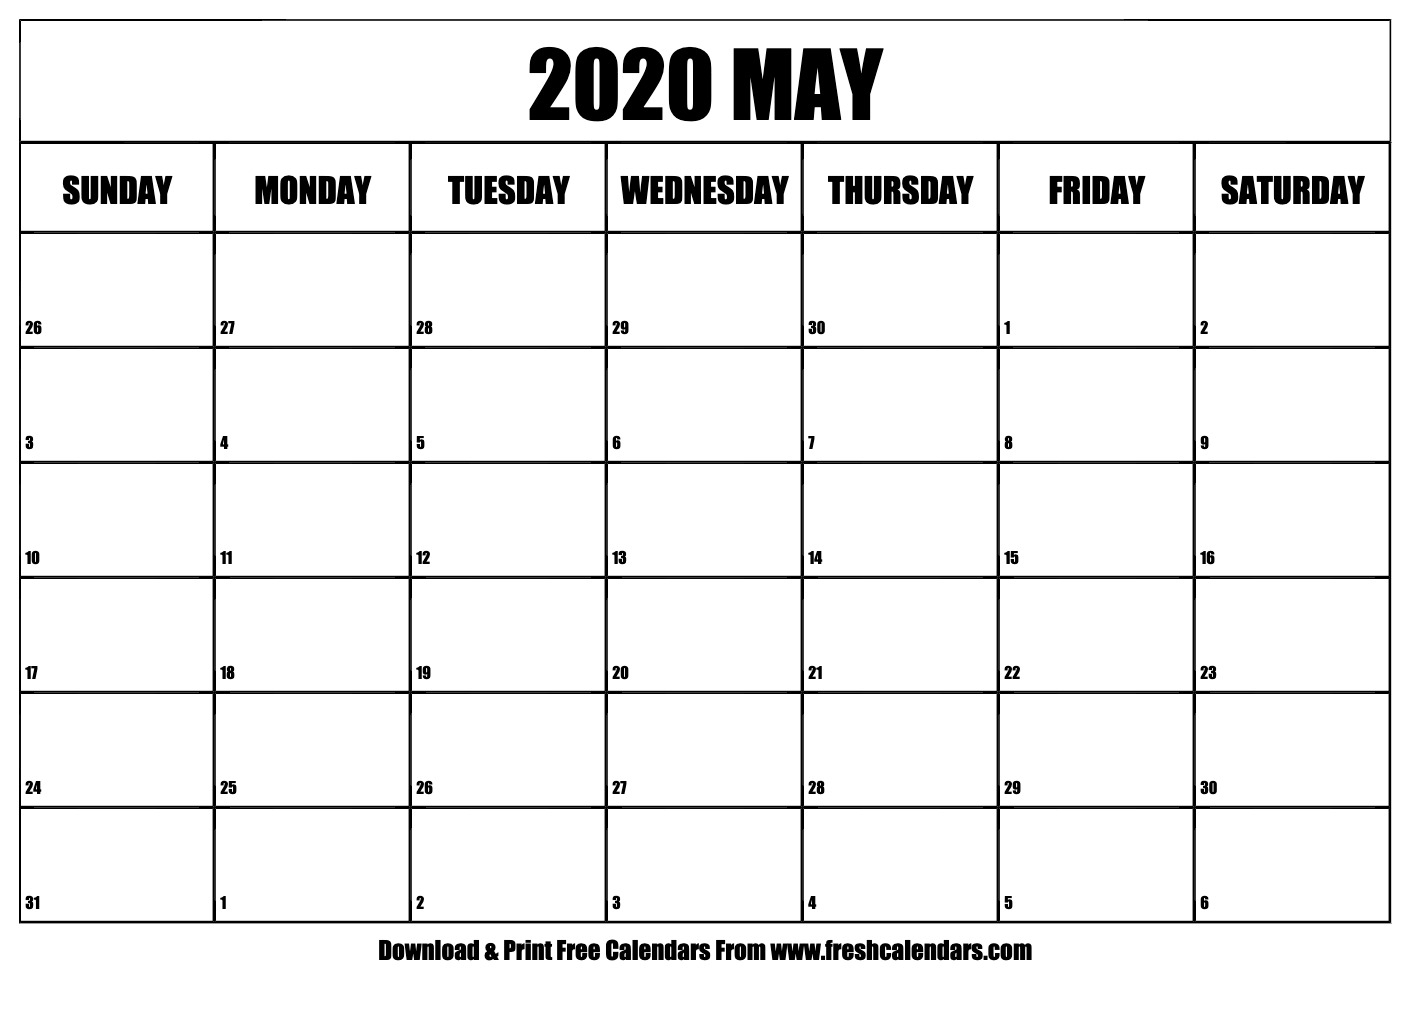 May 2020 Calendar Printable - Fresh Calendars